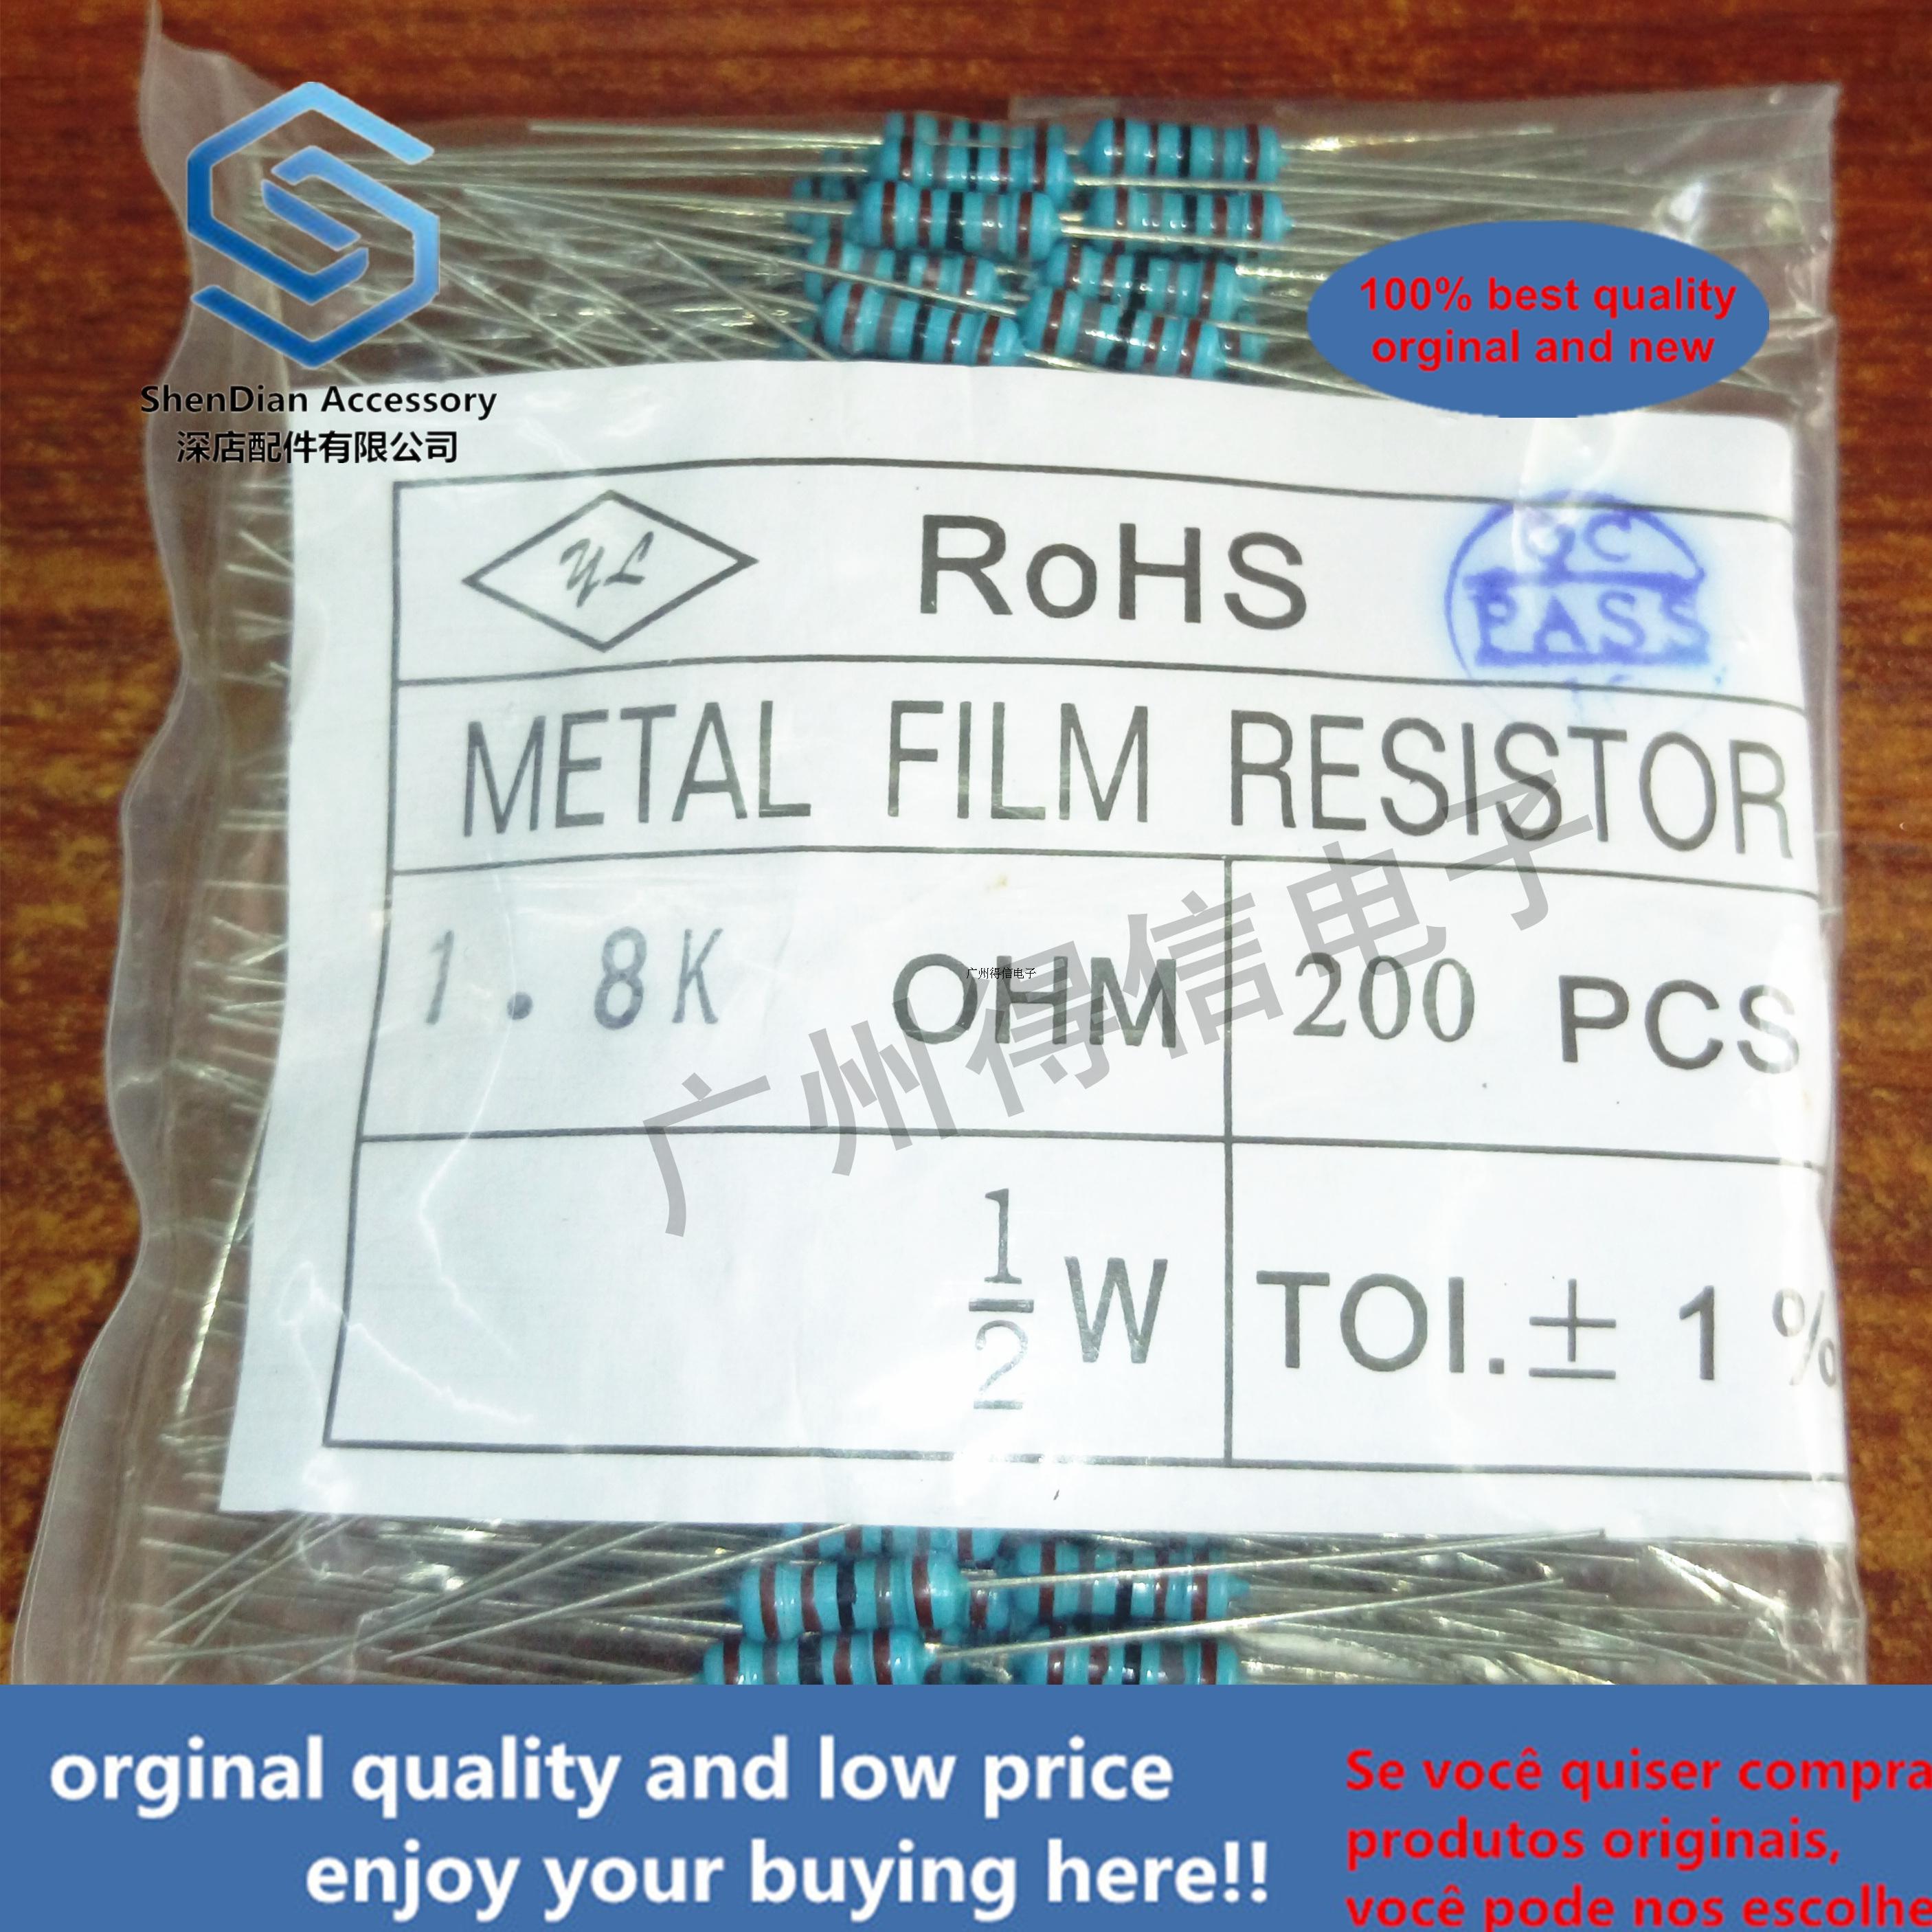 200pcs 1 / 2W 750R 750 Euro 1% Brand New Metal Film Iron Feet Resistance Bag Pack 200 Pcs